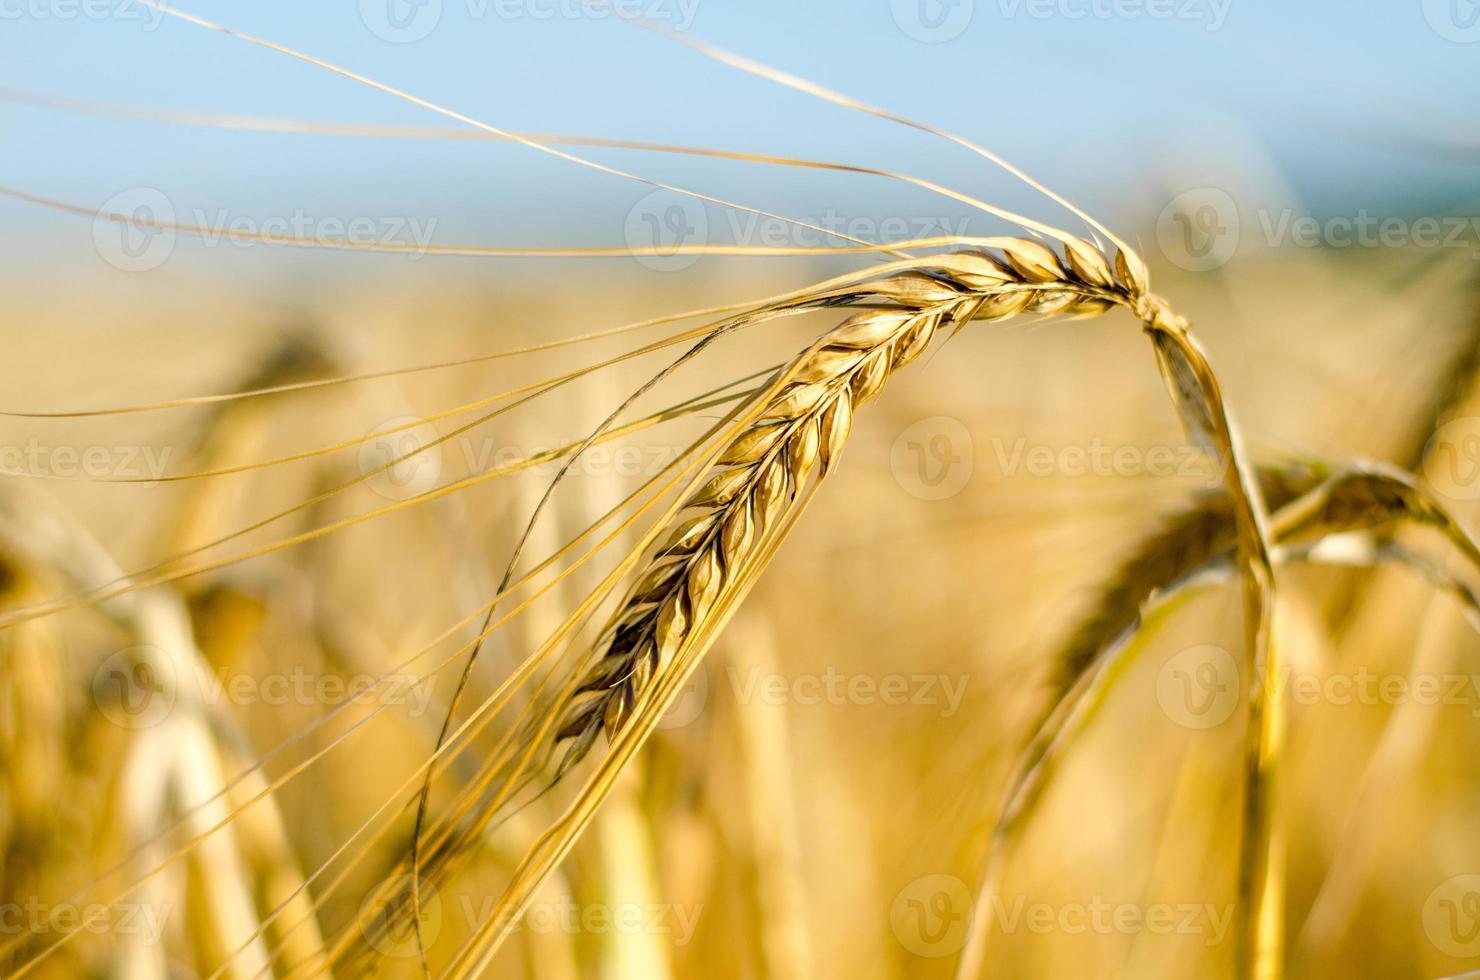 Cornfield - Growing Corn photo